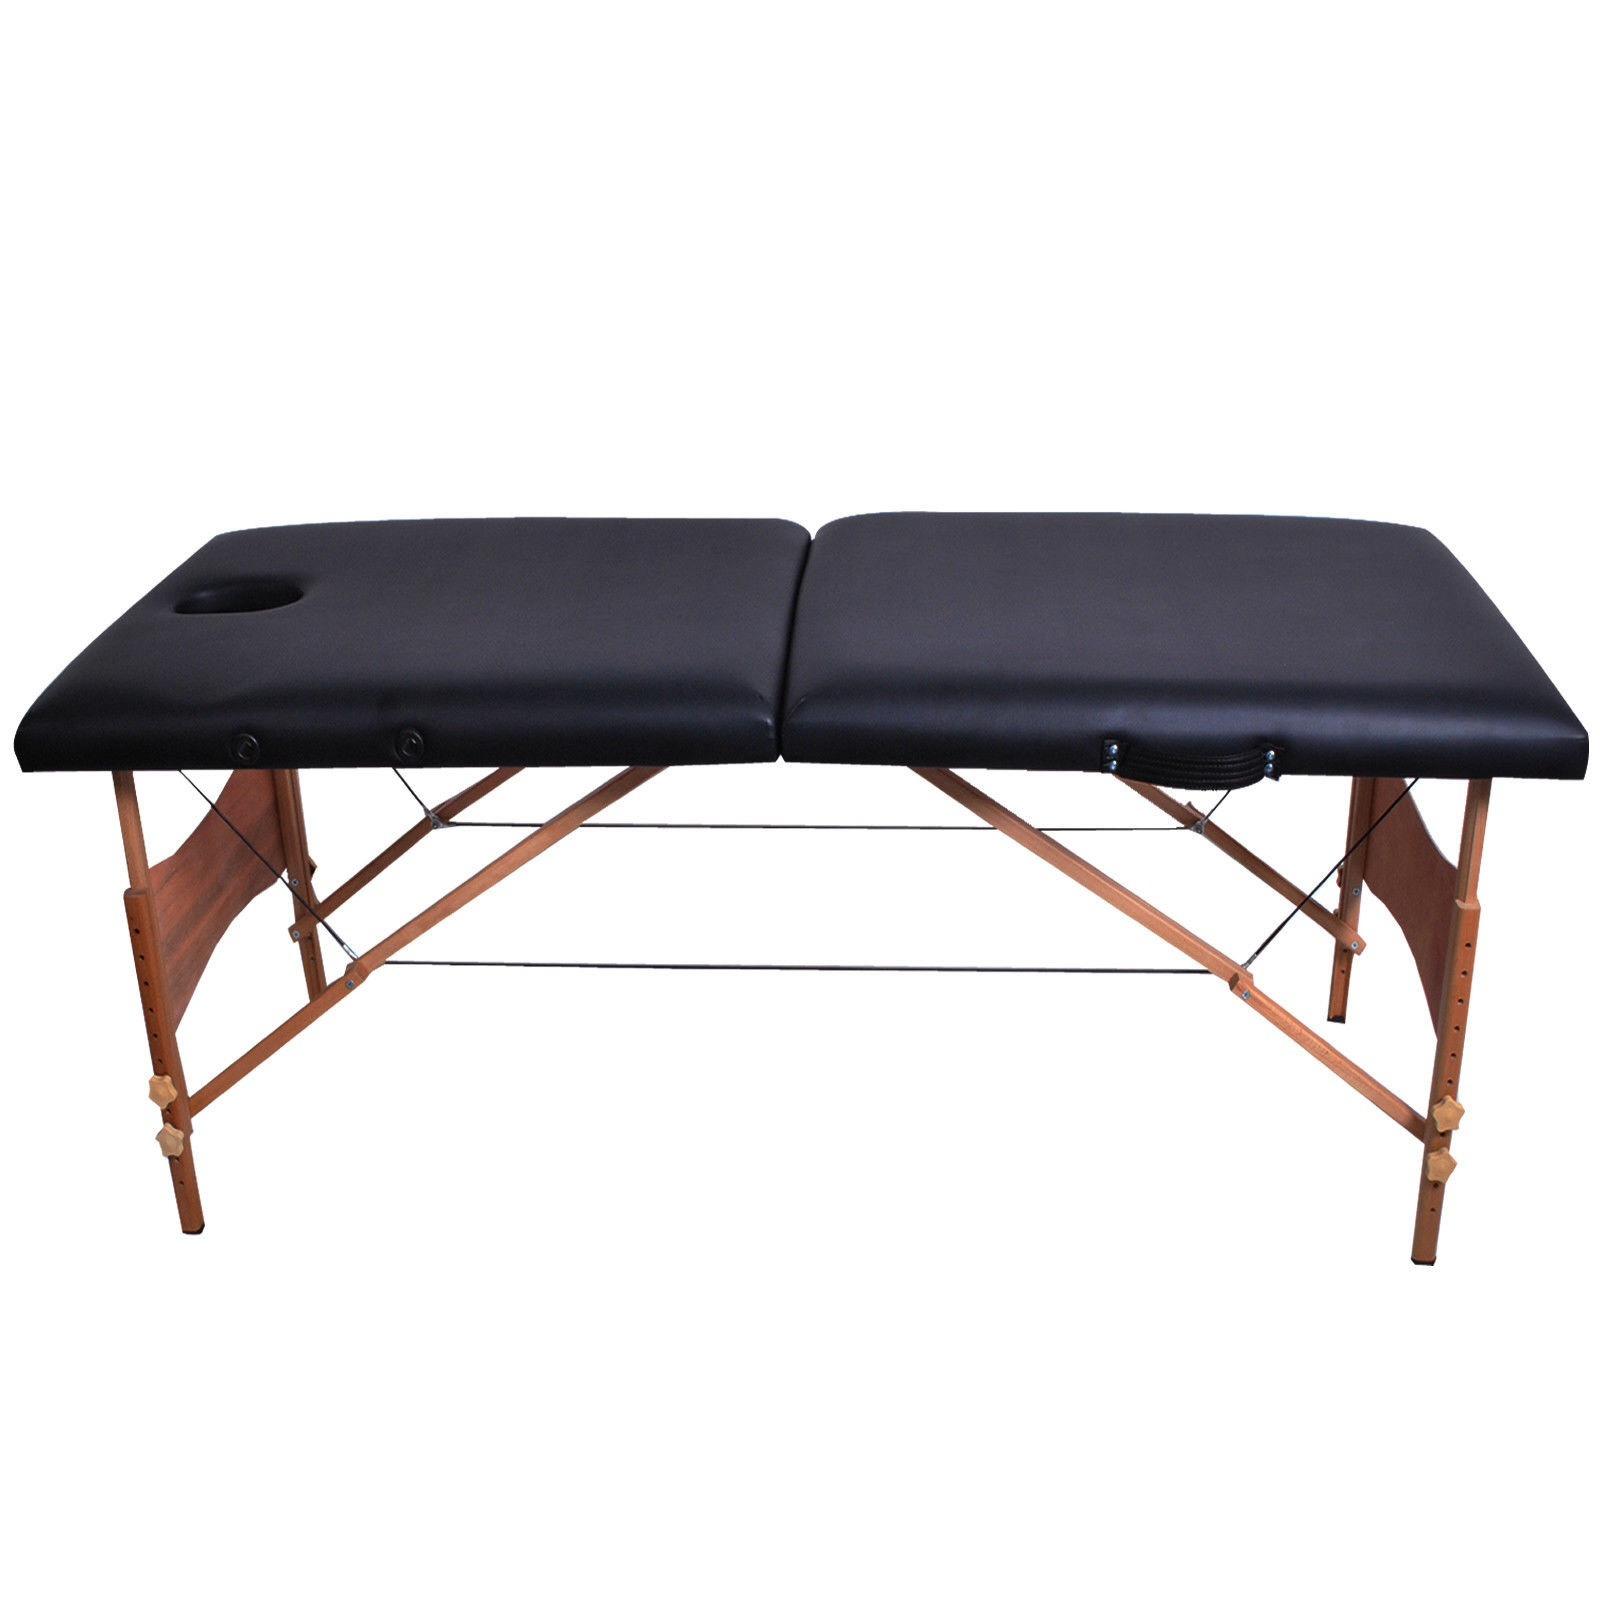 Saloniture Professional Portable Folding Massage Table ... |Massage Table